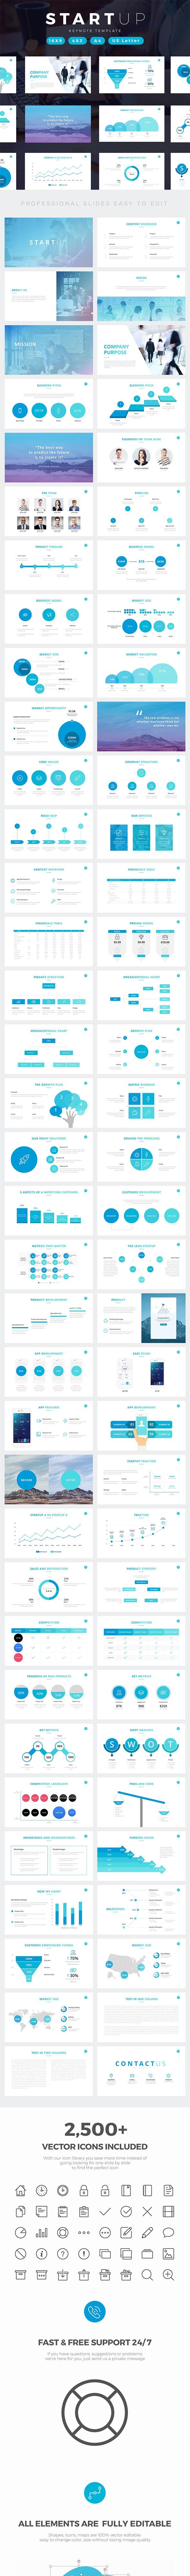 Startup Company Pitch Deck Keynote Template - Business Keynote Templates